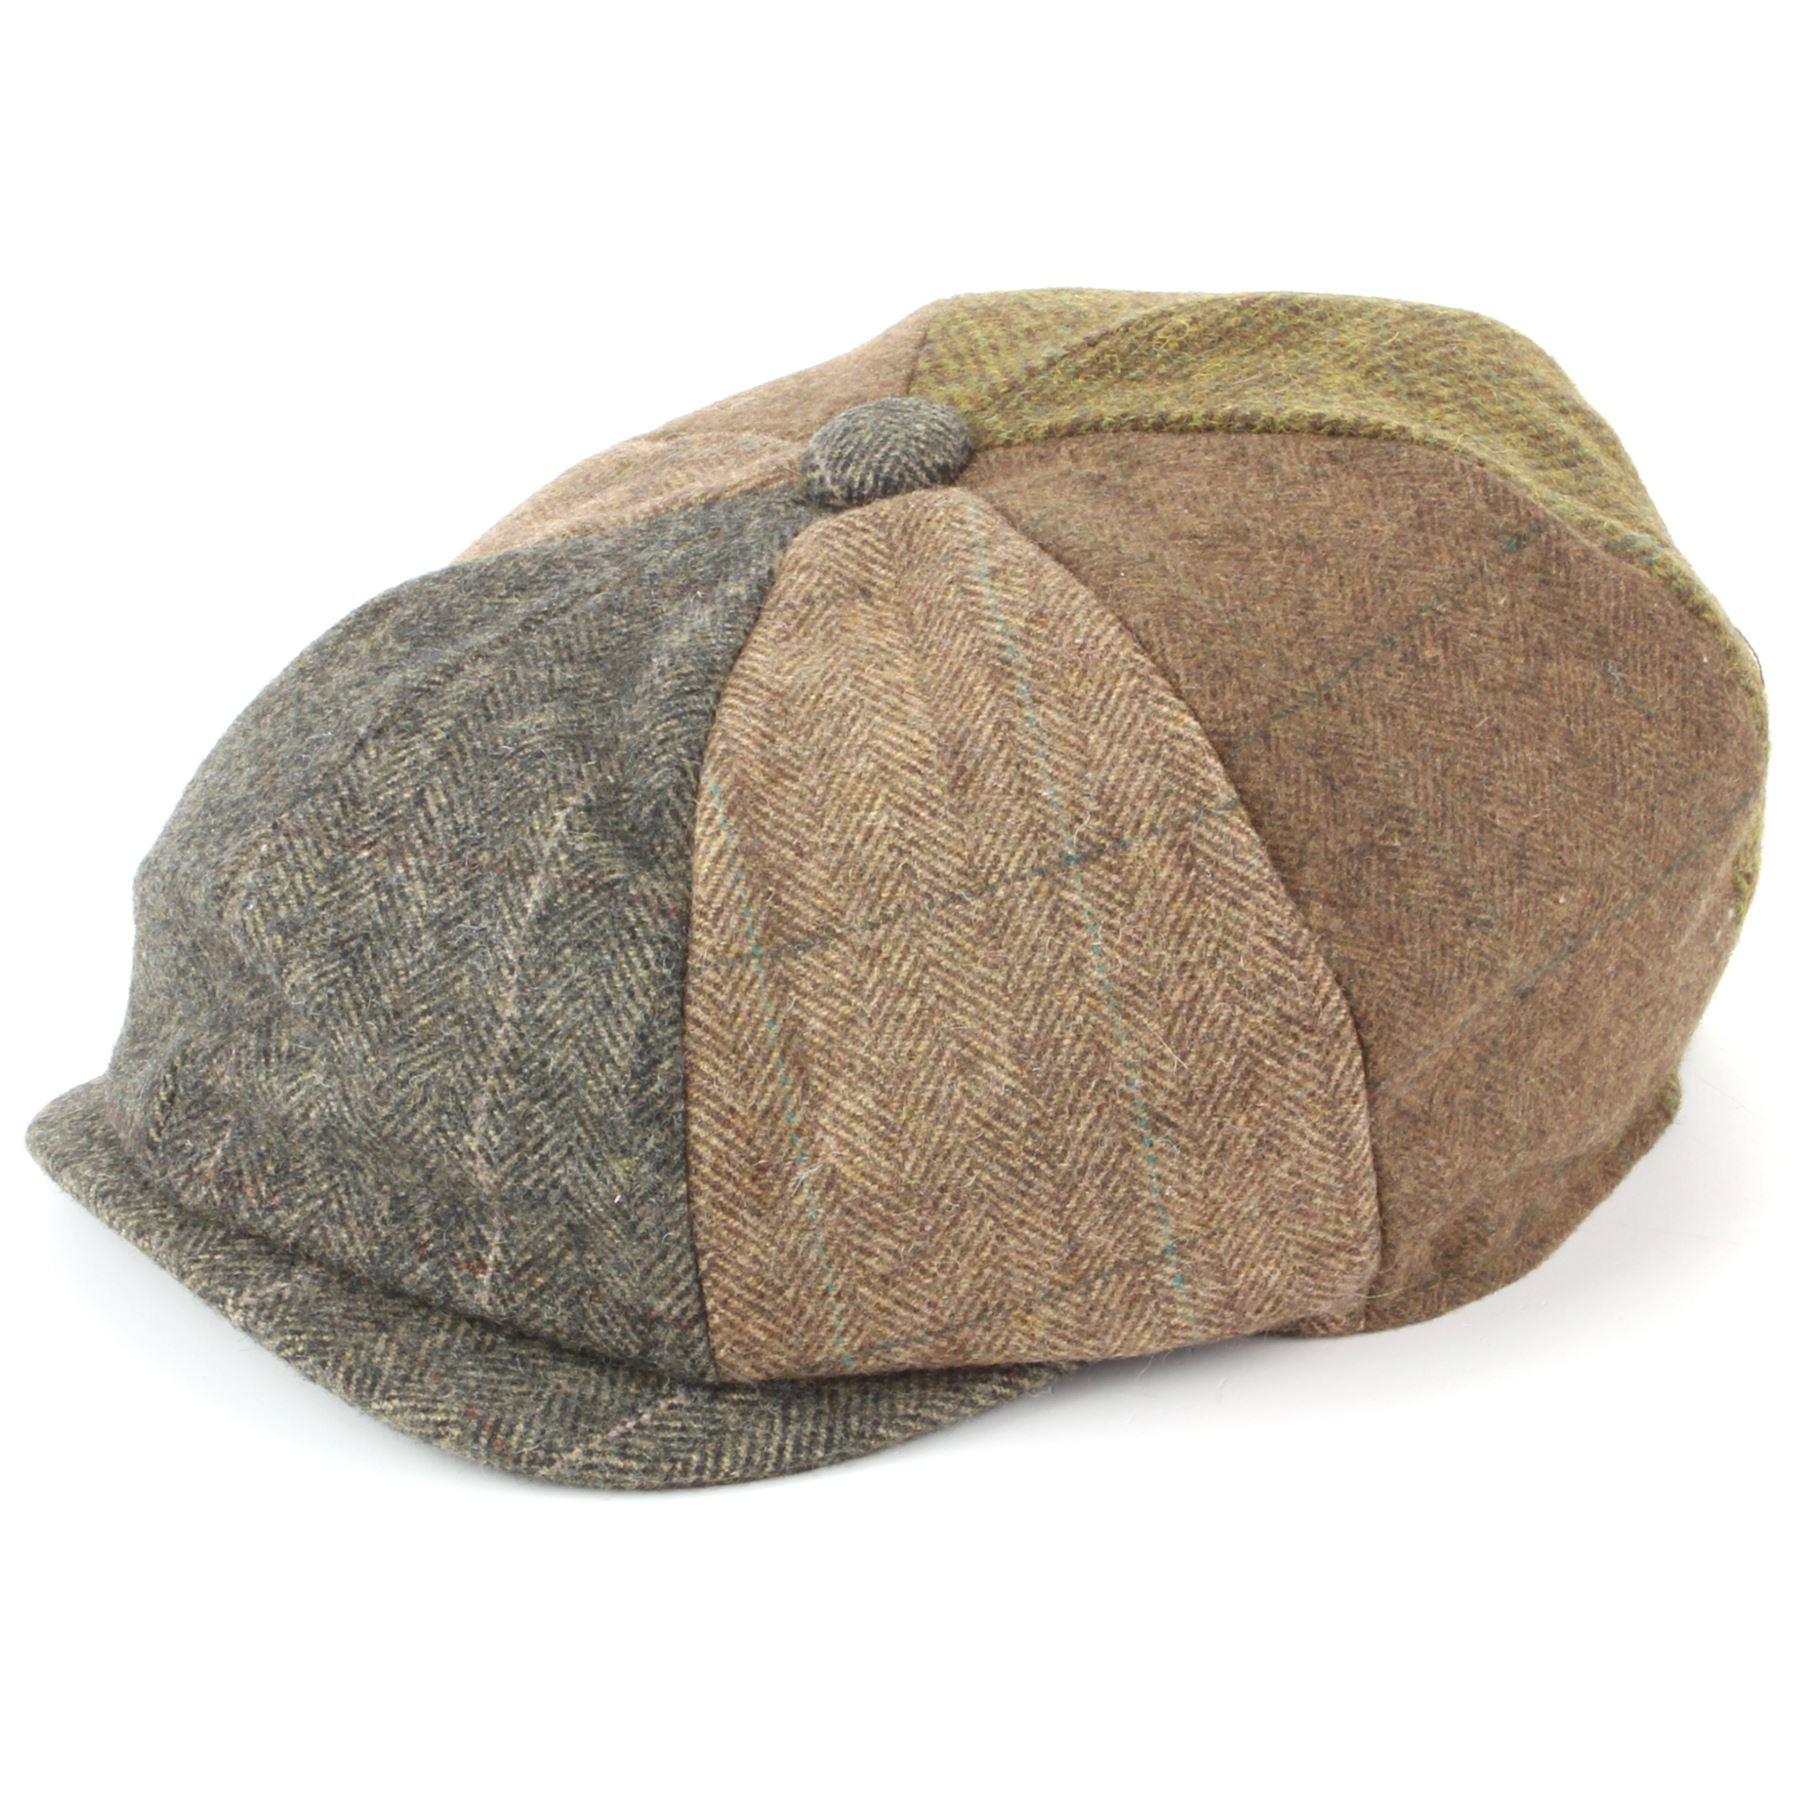 Hat Panel 8 Cap Brown Patchwork Gatsby New Newsboy Tween Flat xSB1R